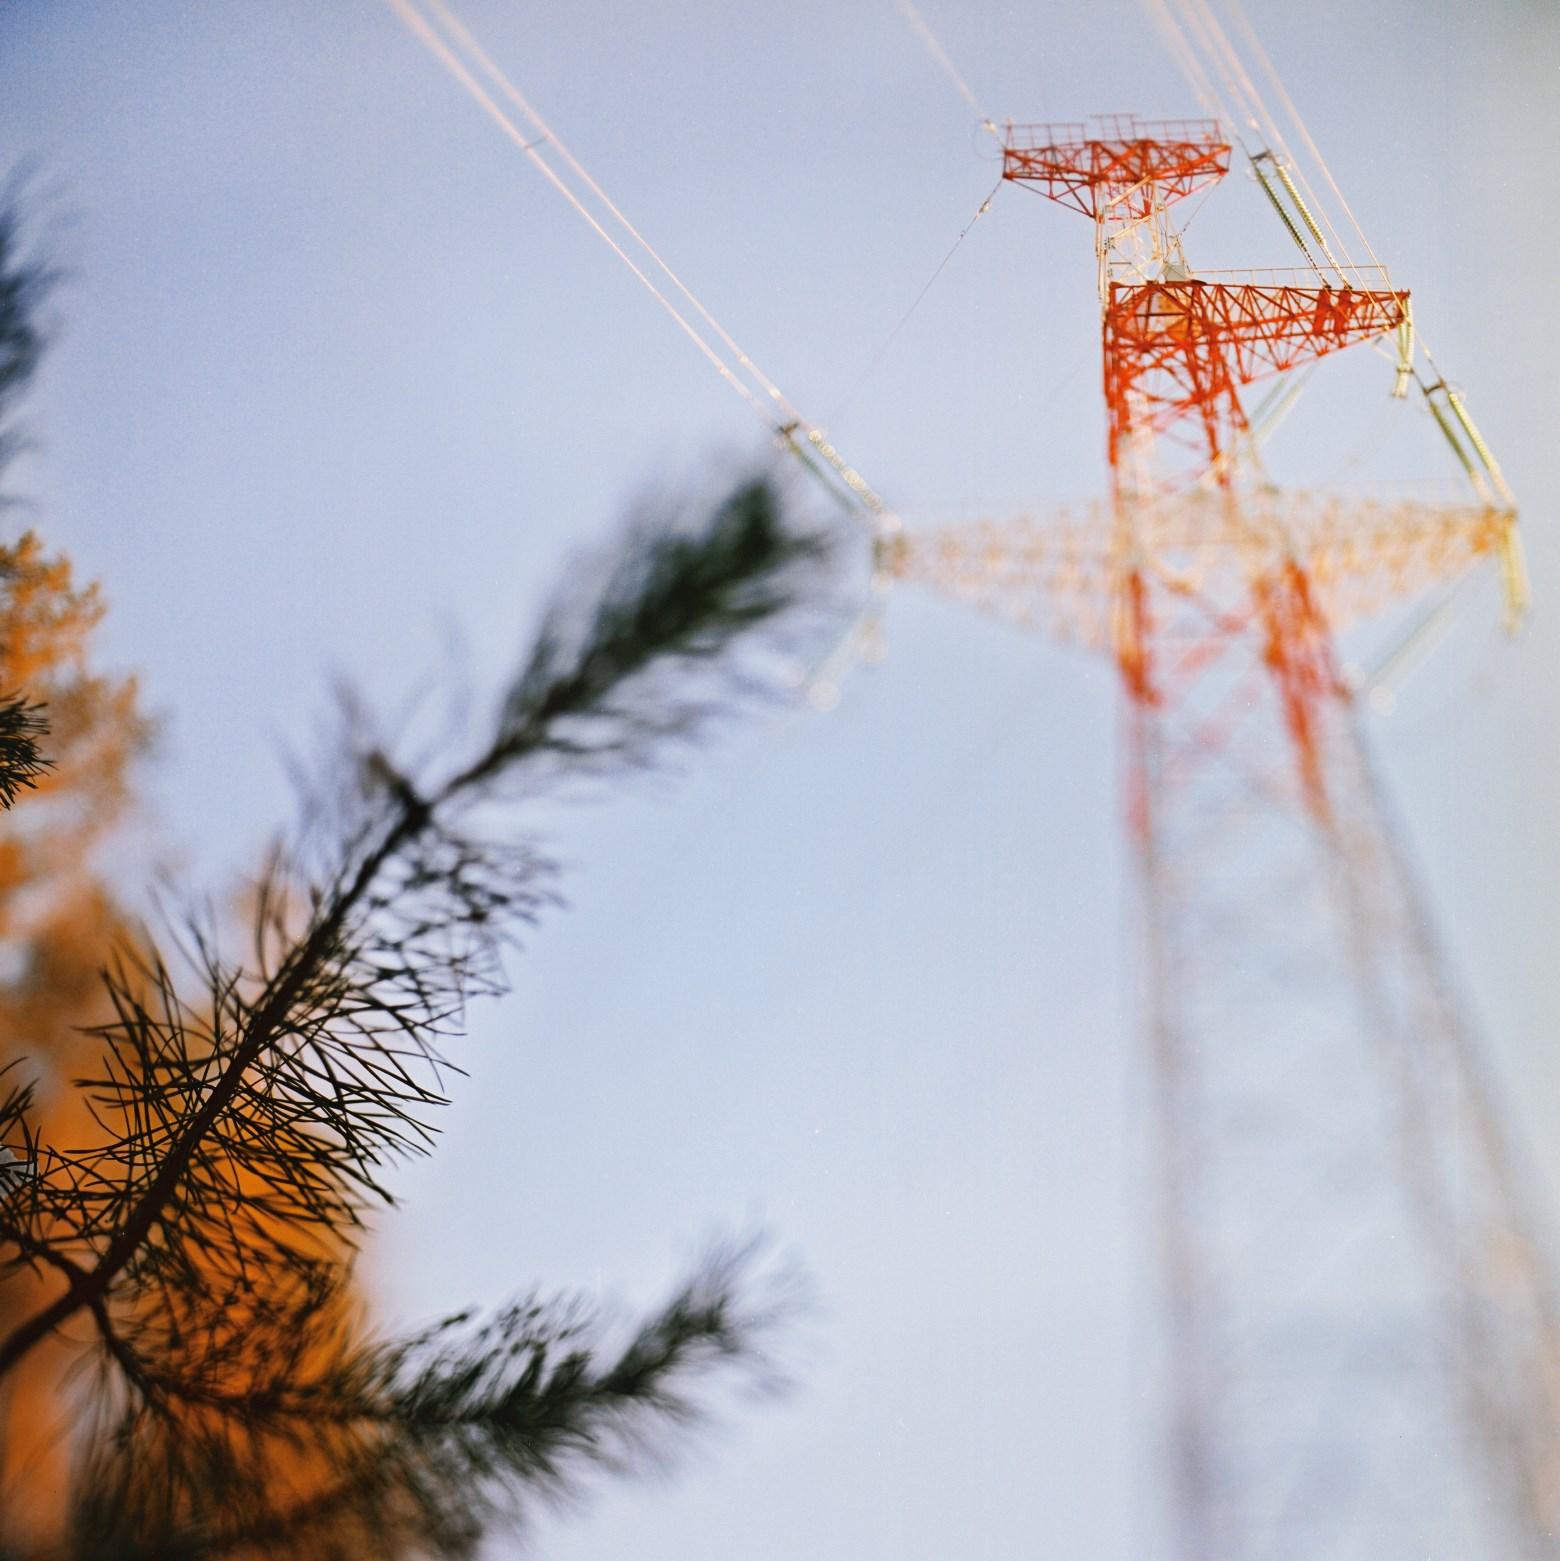 АЭС, фото Максим Шумилин